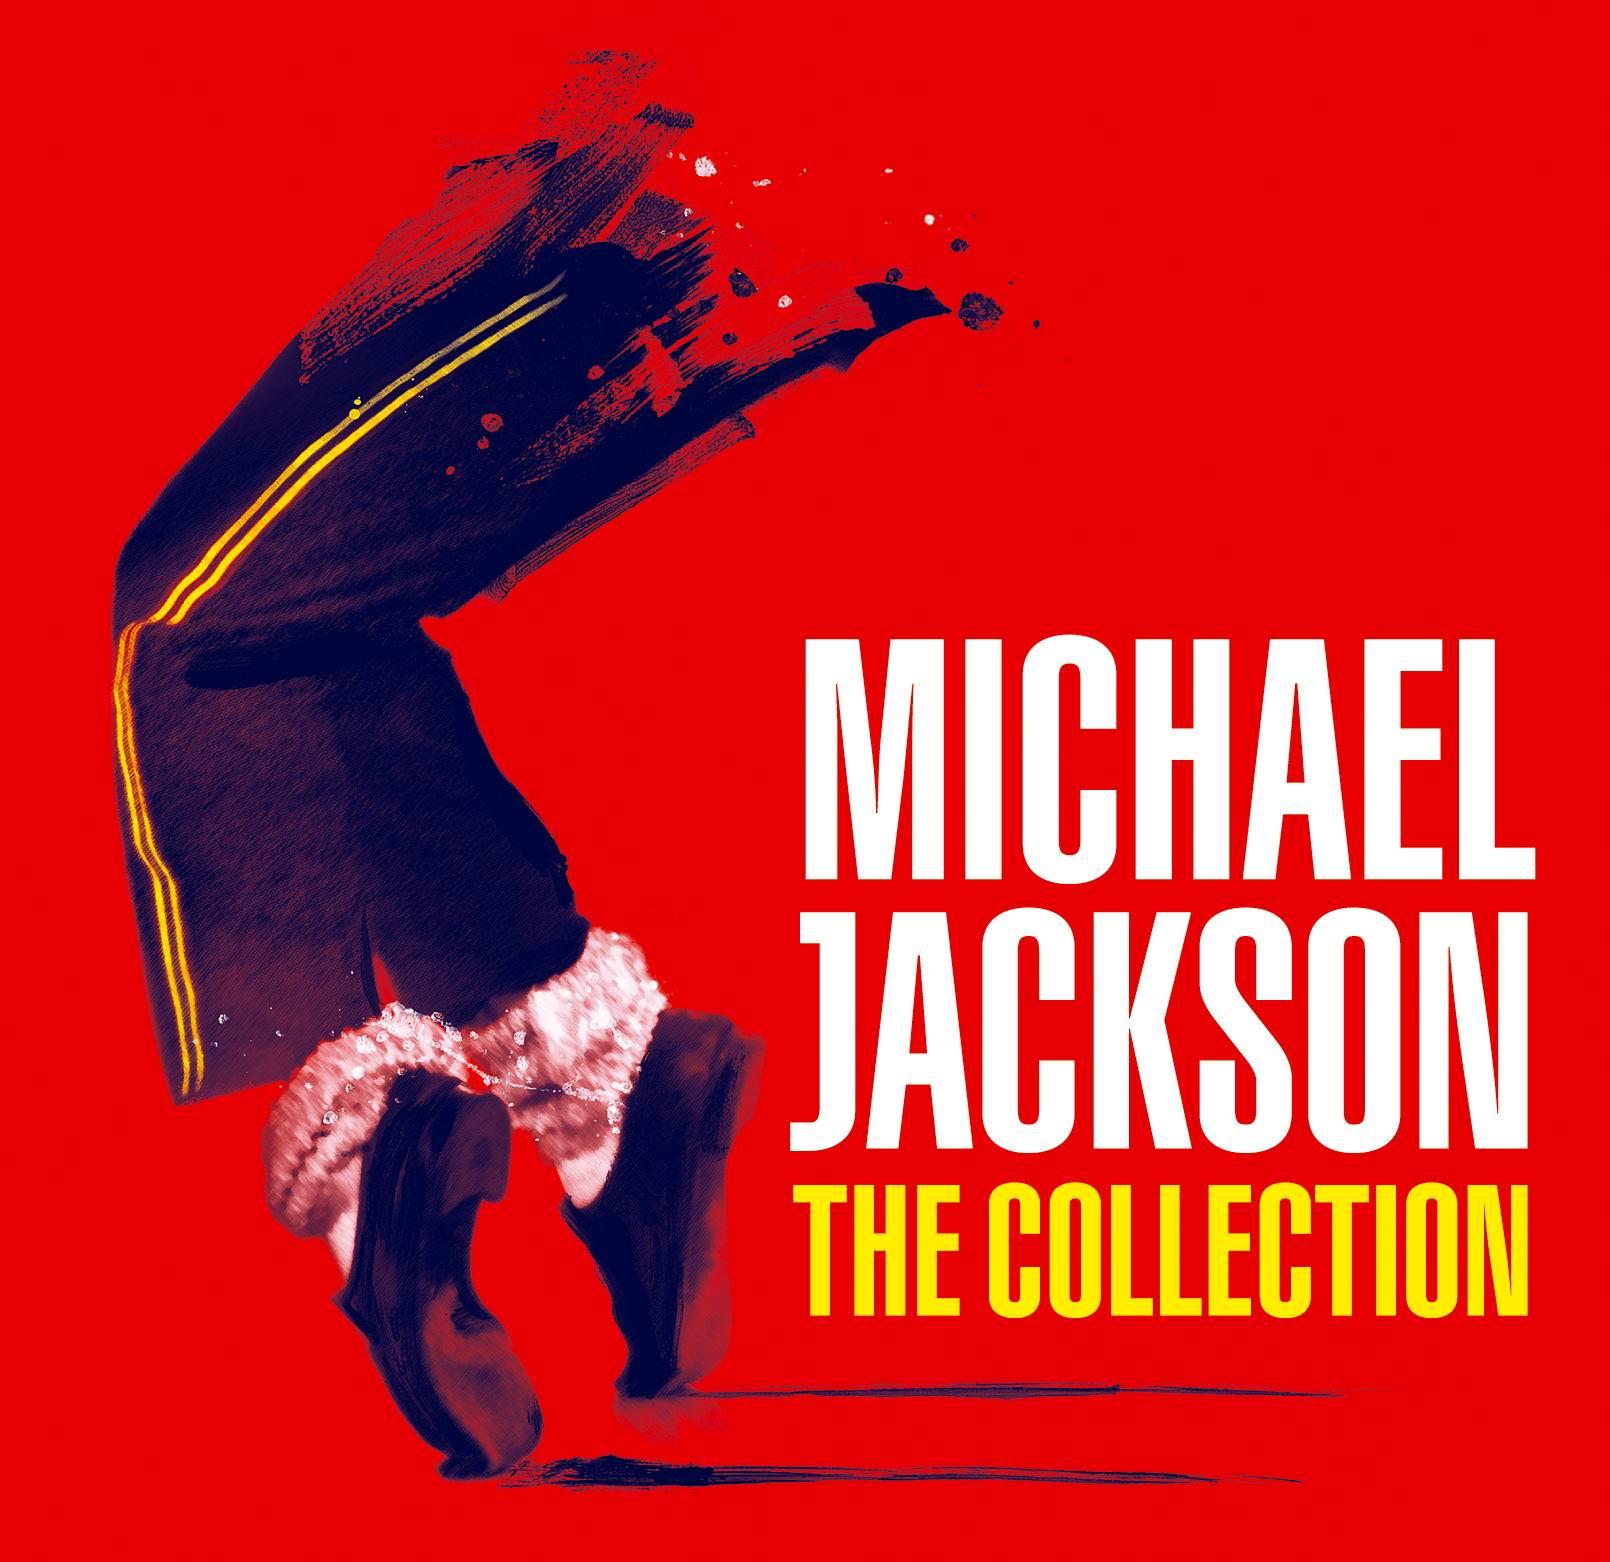 Michael Jackson Quot The Collection Quot 5 Cd Box